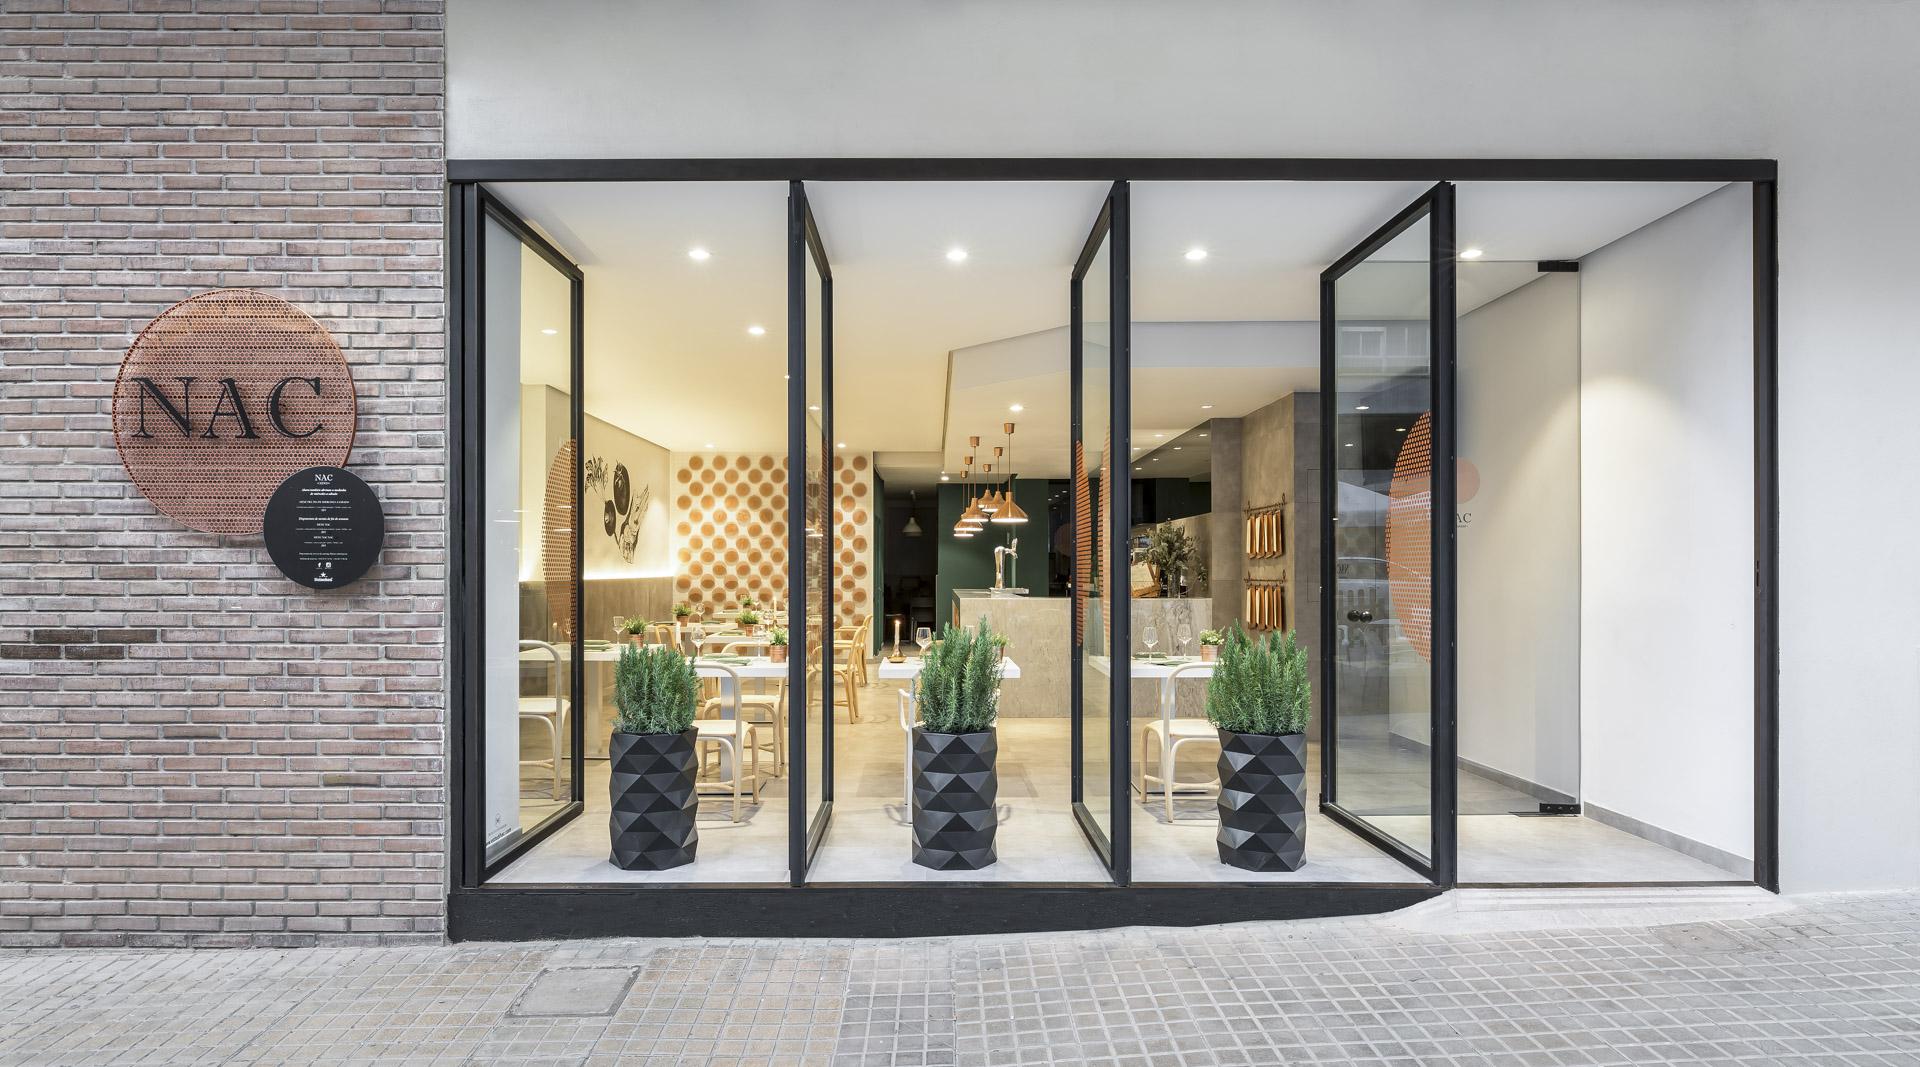 fotografia-arquitectura-valencia-german-cabo-estudihac-restaurante-nac-ontinyent-02